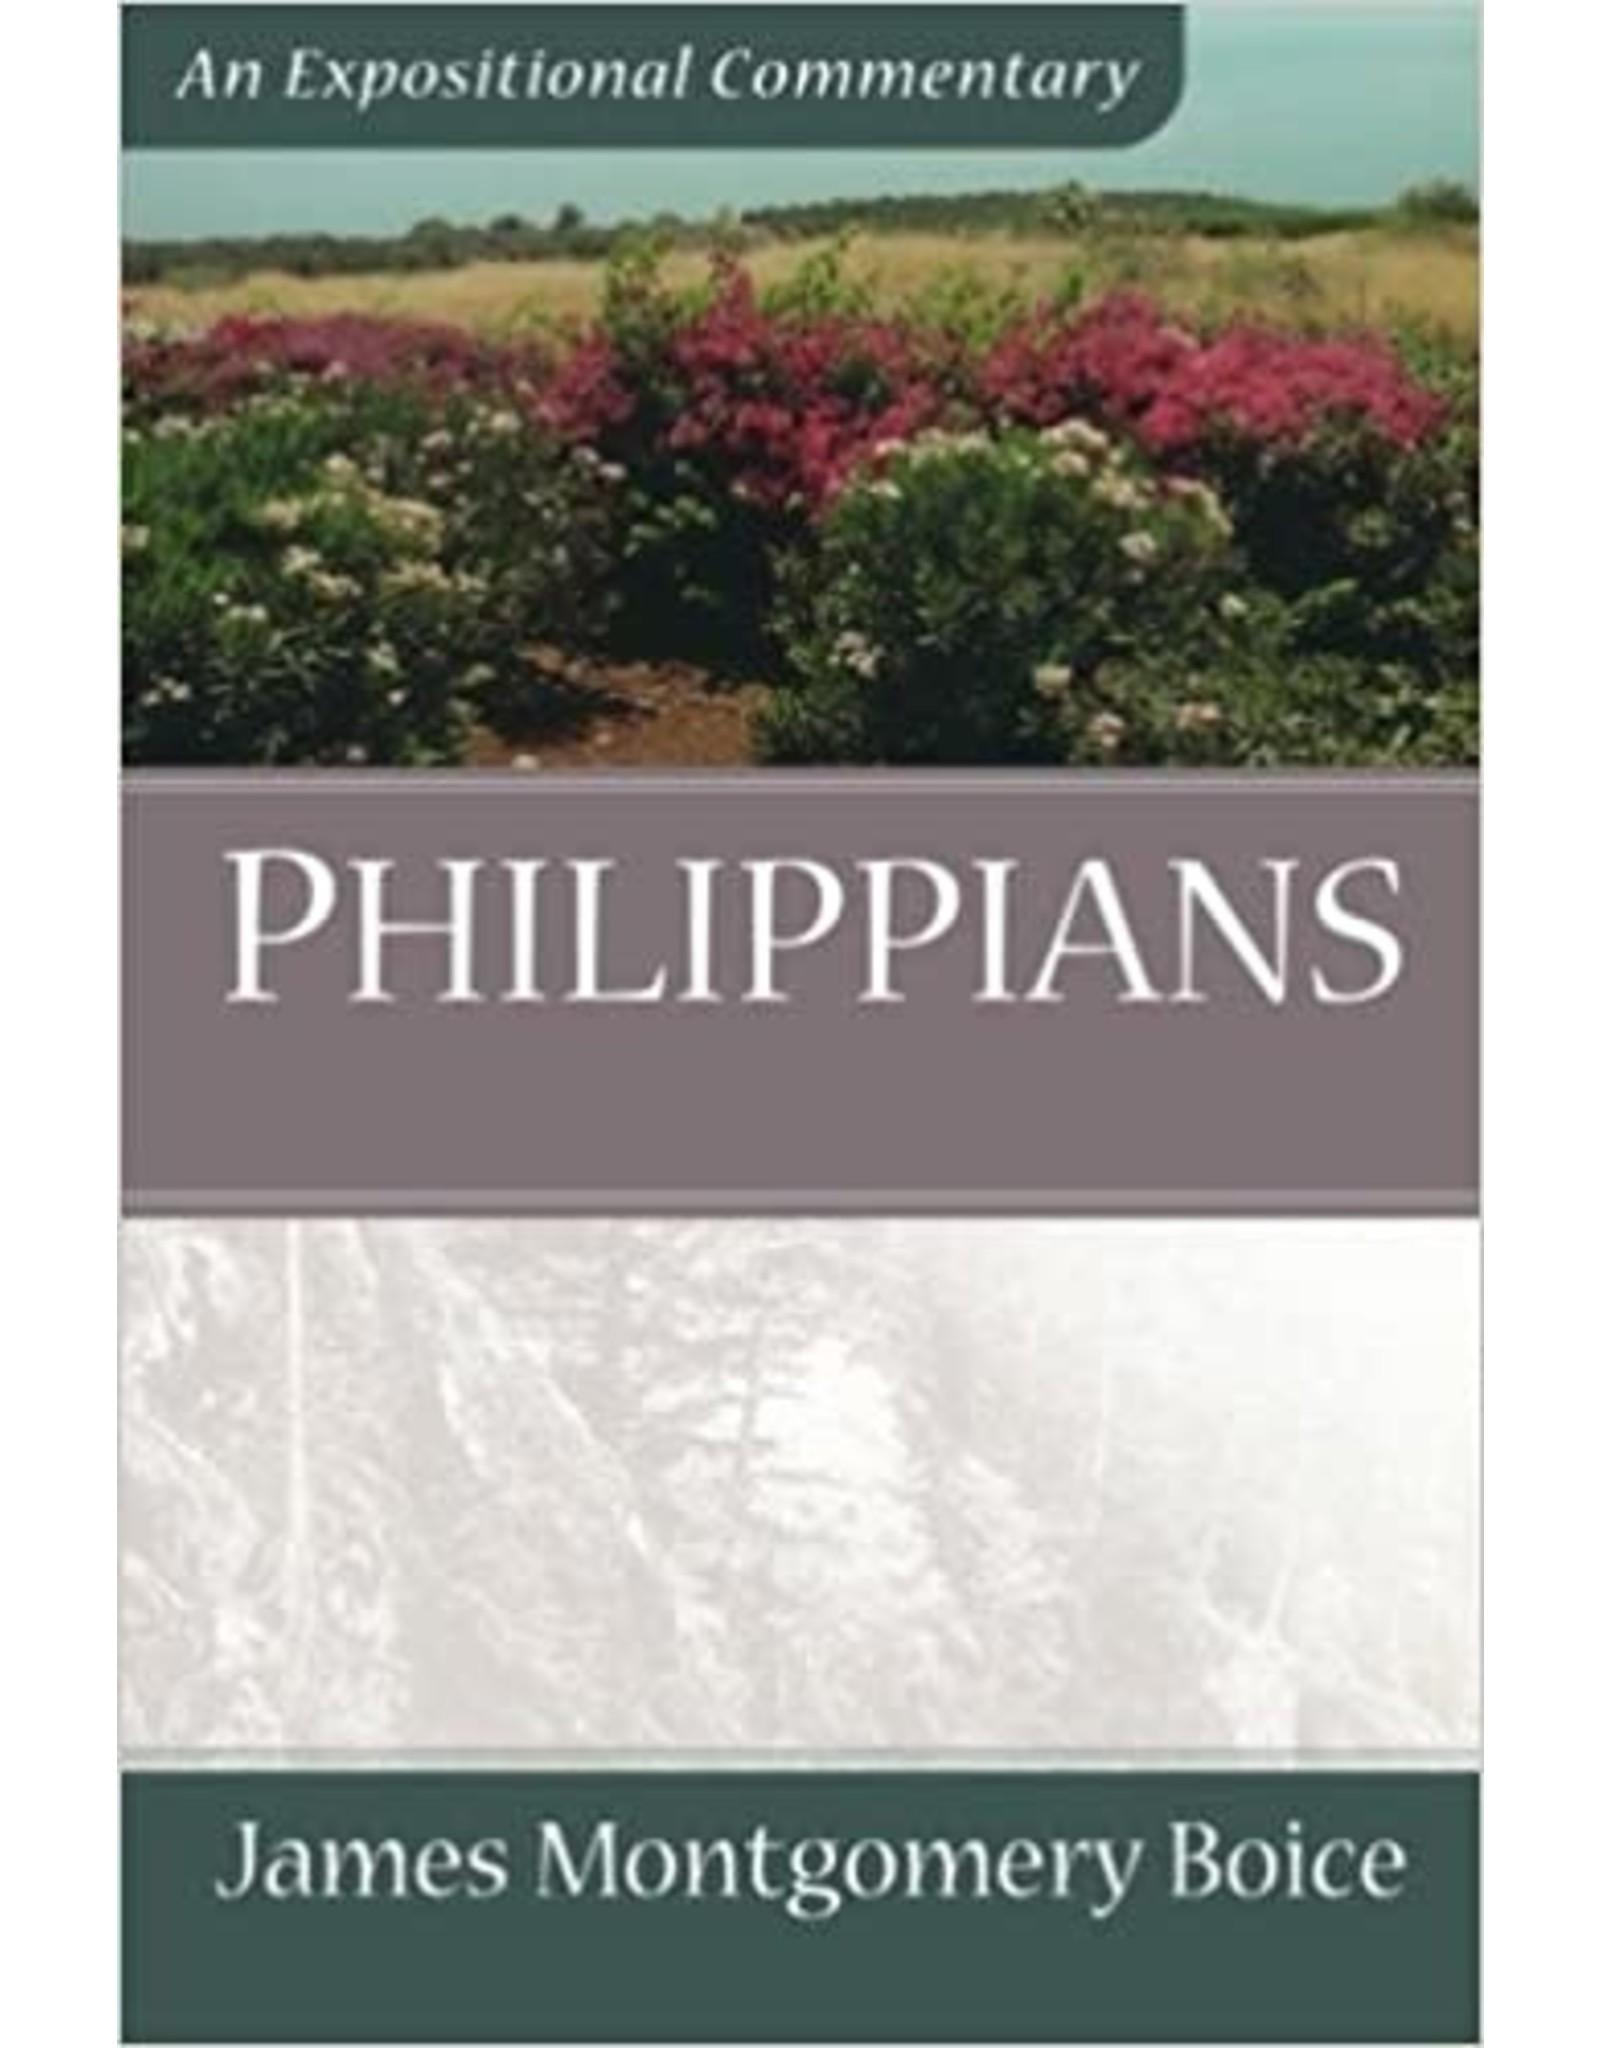 Boice Philippians: An Expositional Commentary